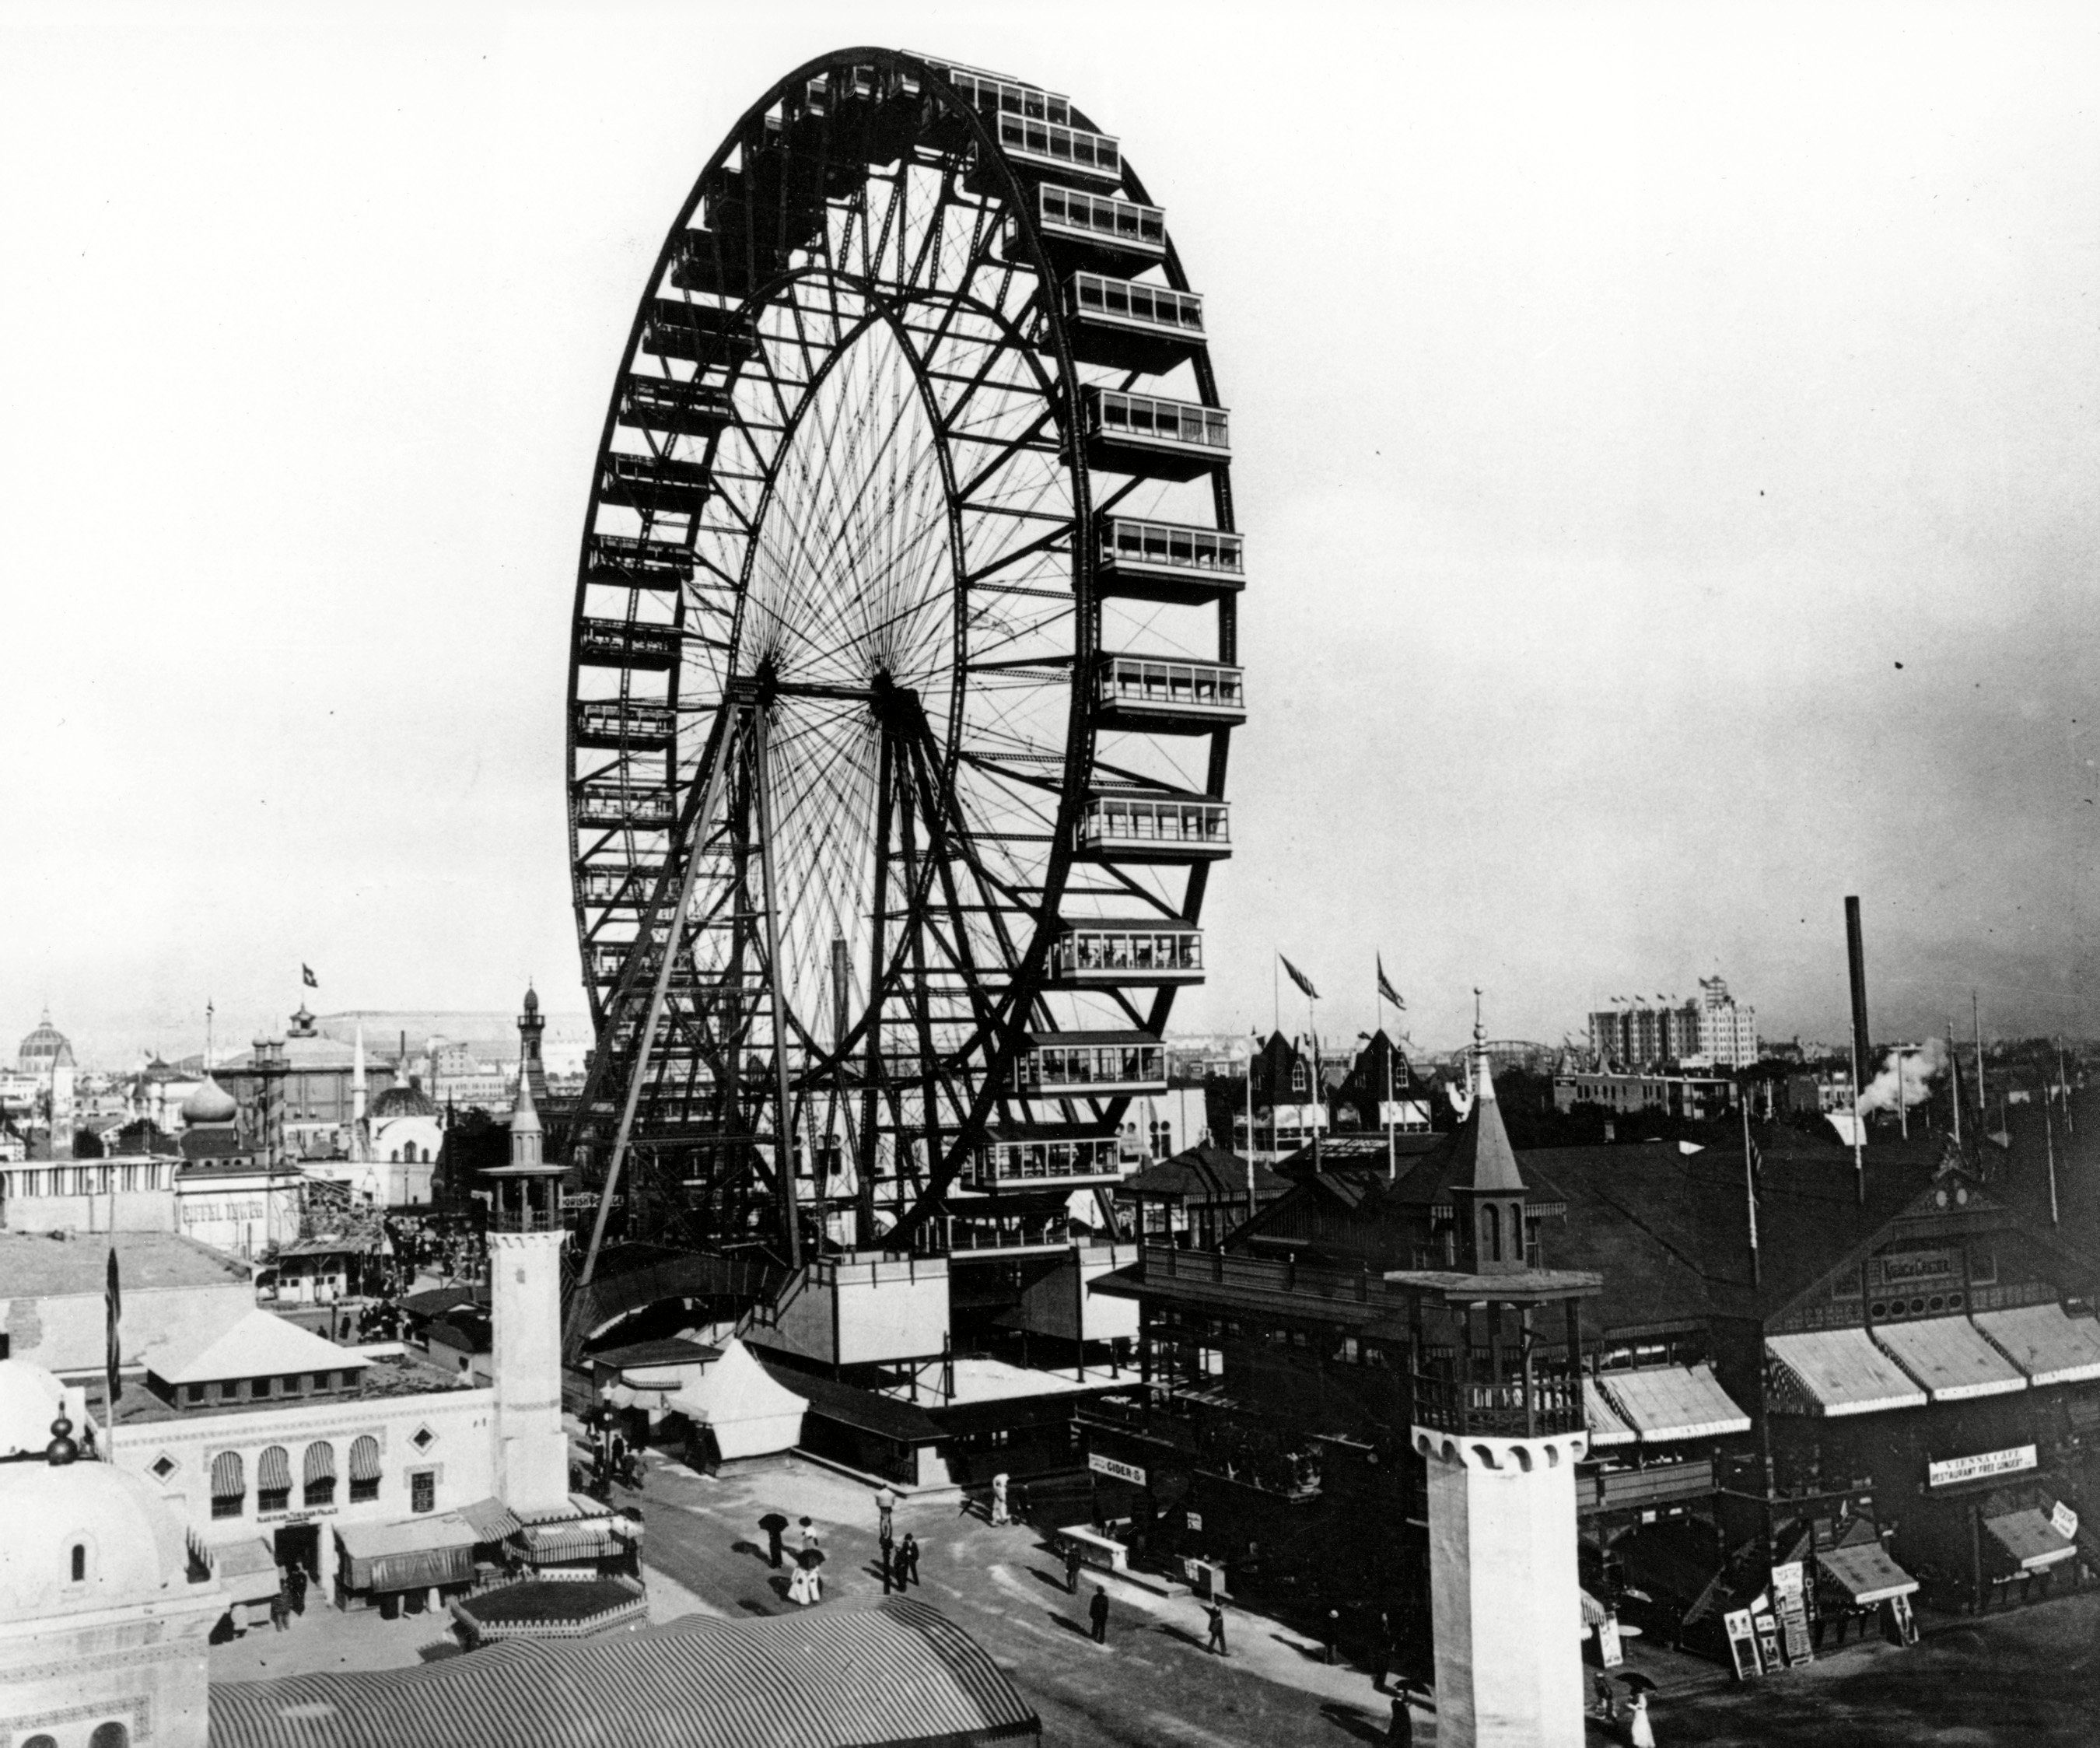 London Olympics Worlds Fair, Chicago, USA